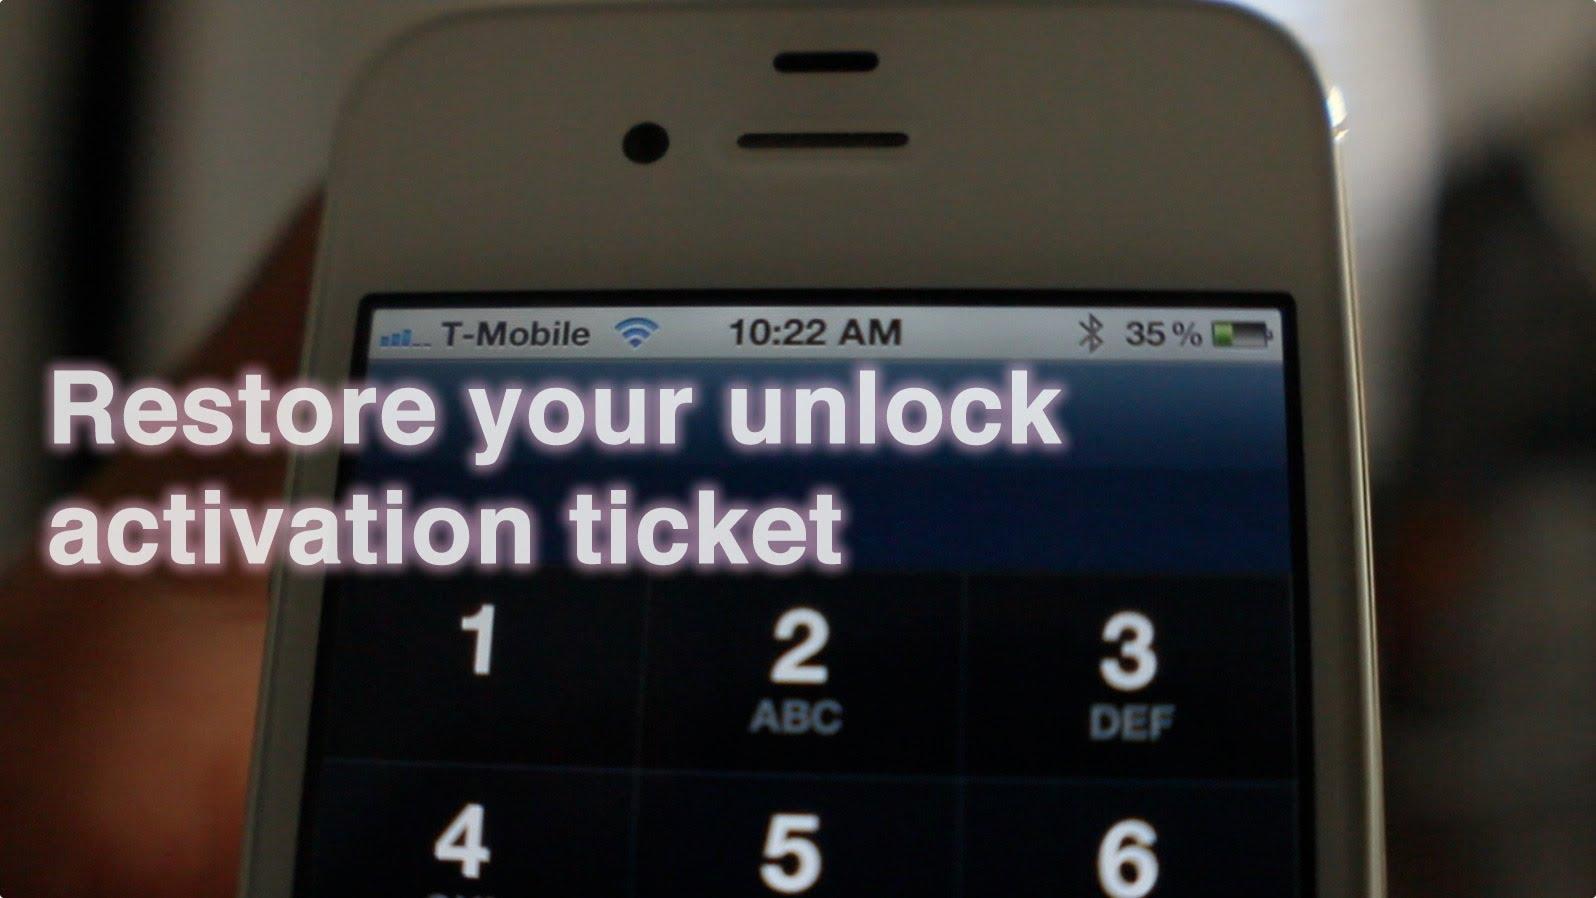 Анлок любого iPhone на iOS 5 при помощи метода SAM